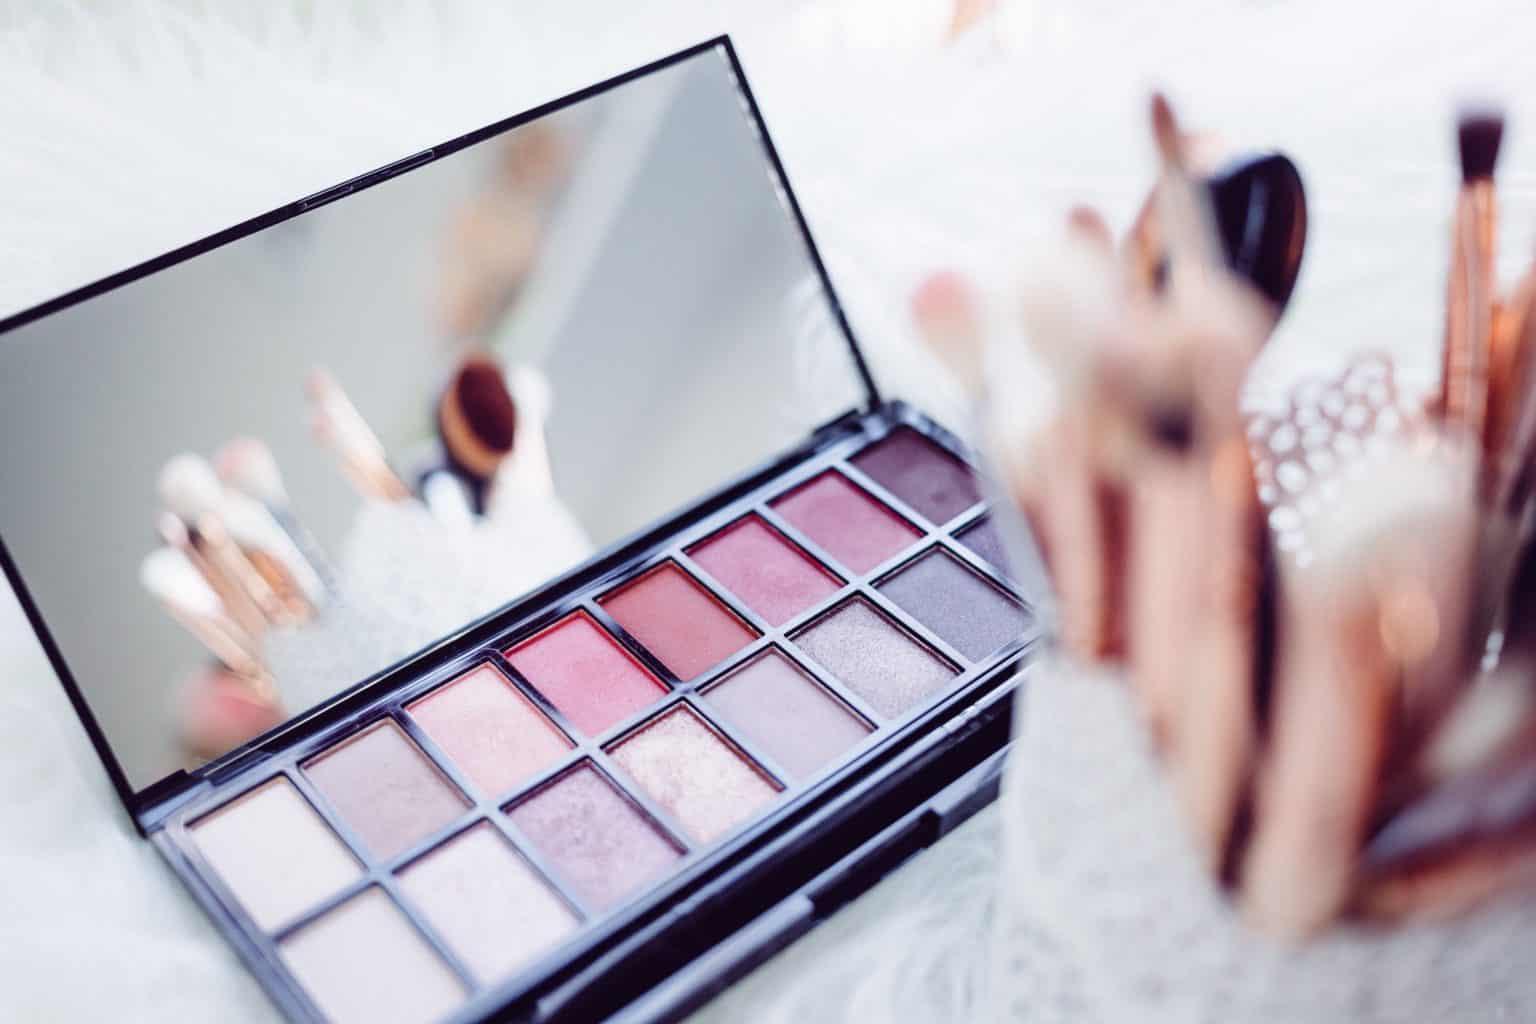 Brazilian Beauty influencers